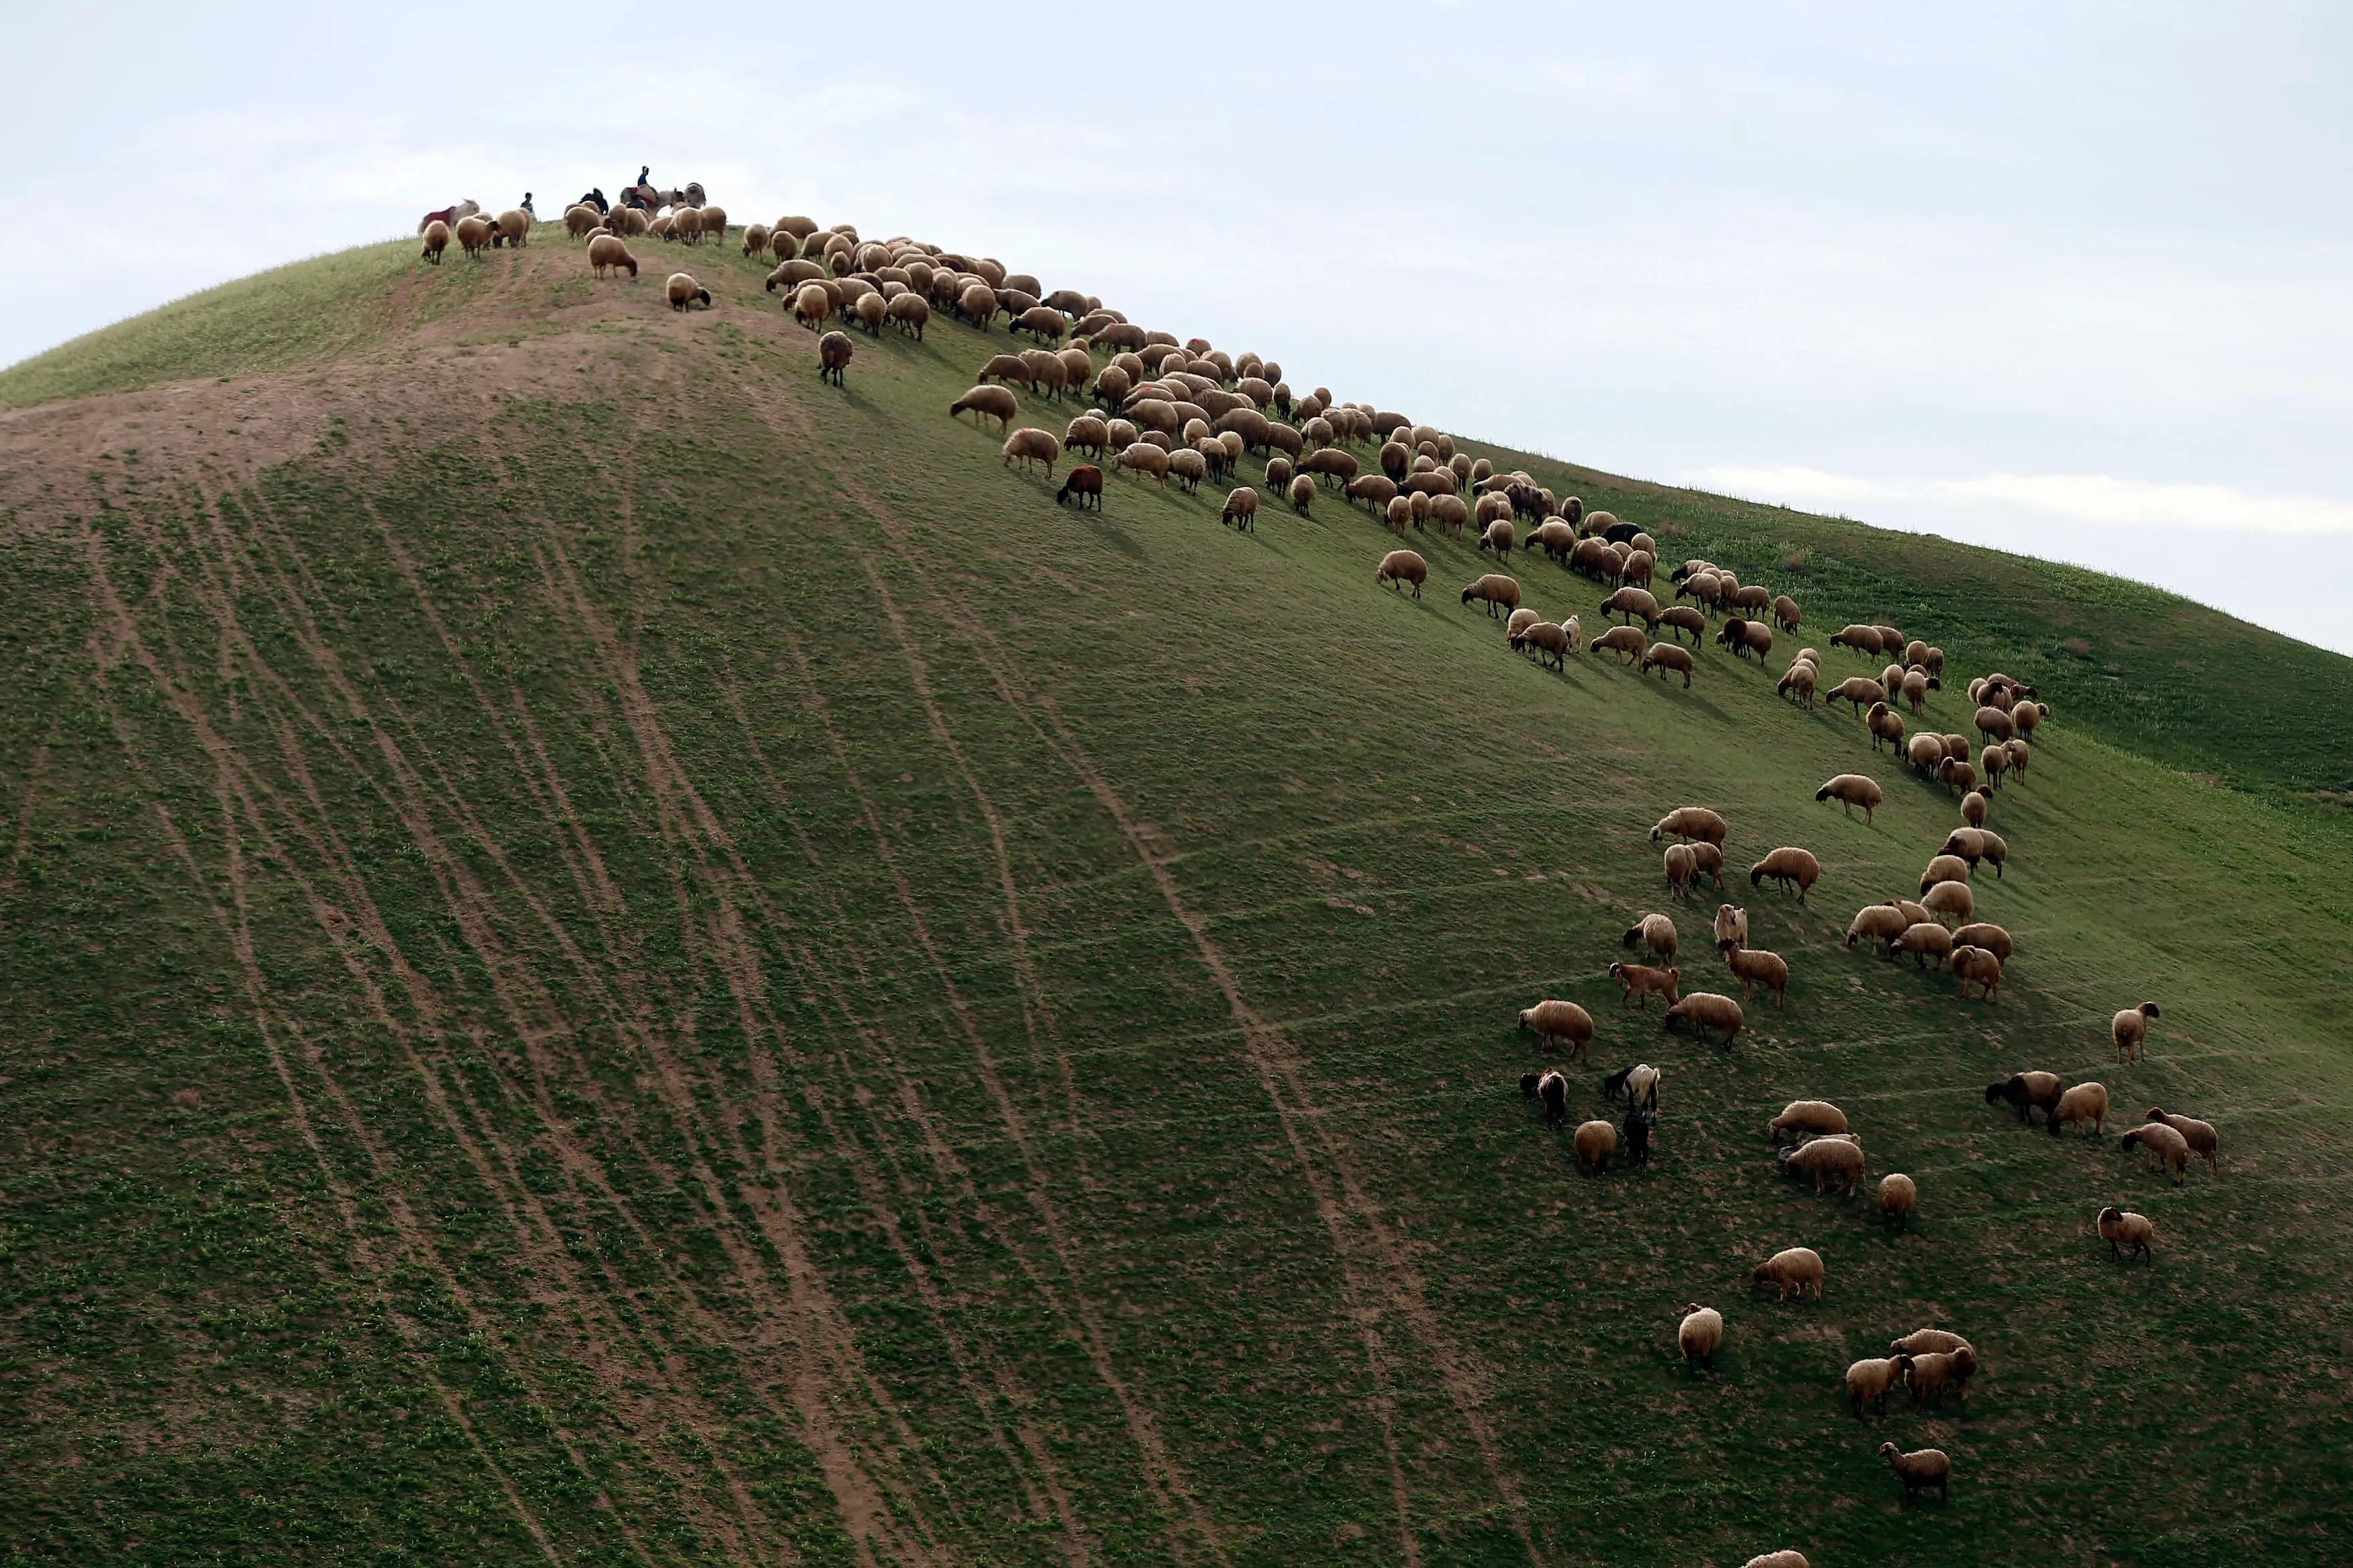 Palestinians herd sheep in Israeli's Judean desert.